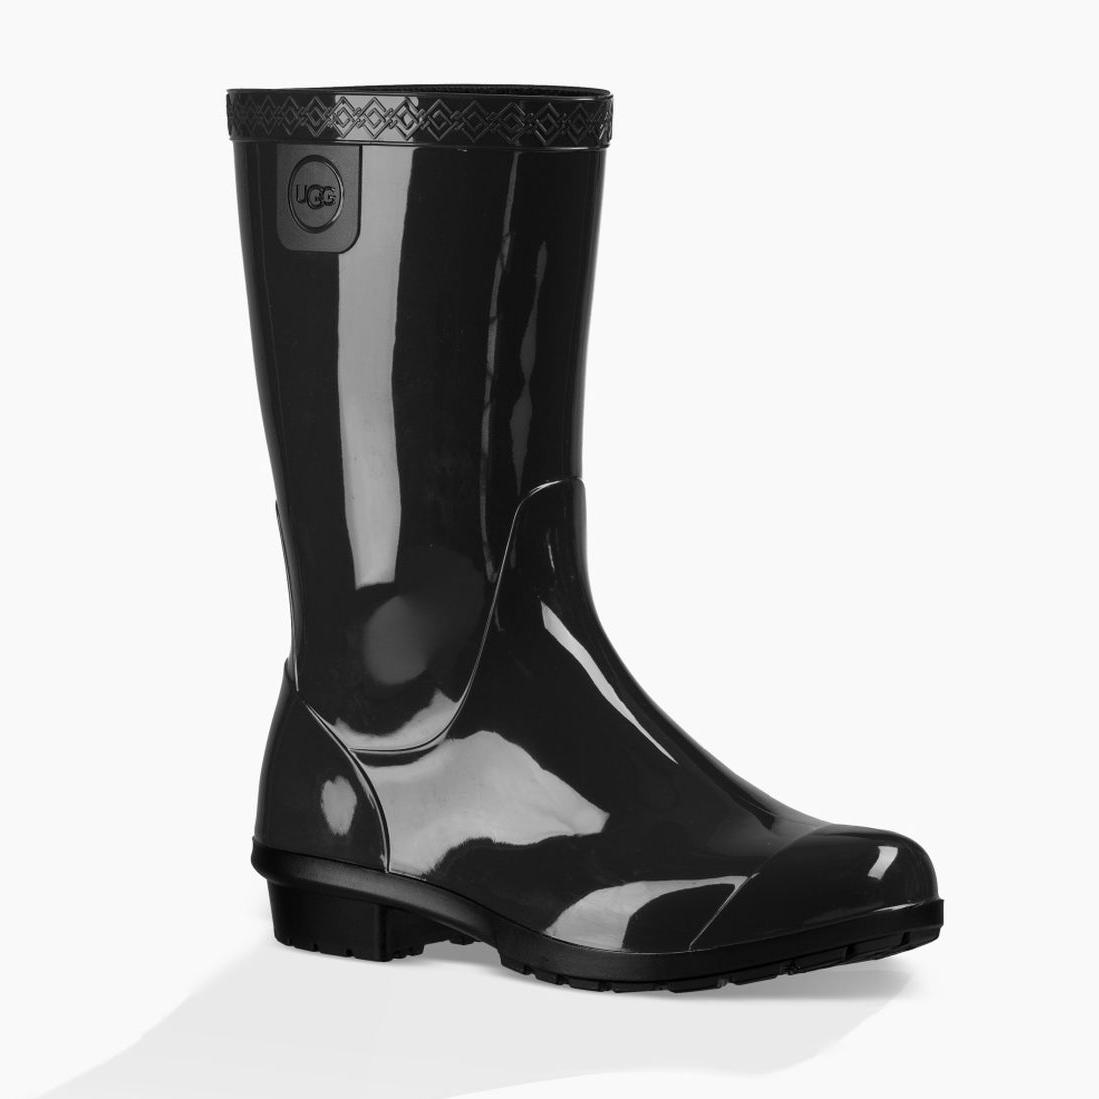 UGG Kid's Raana Rain Boot Black